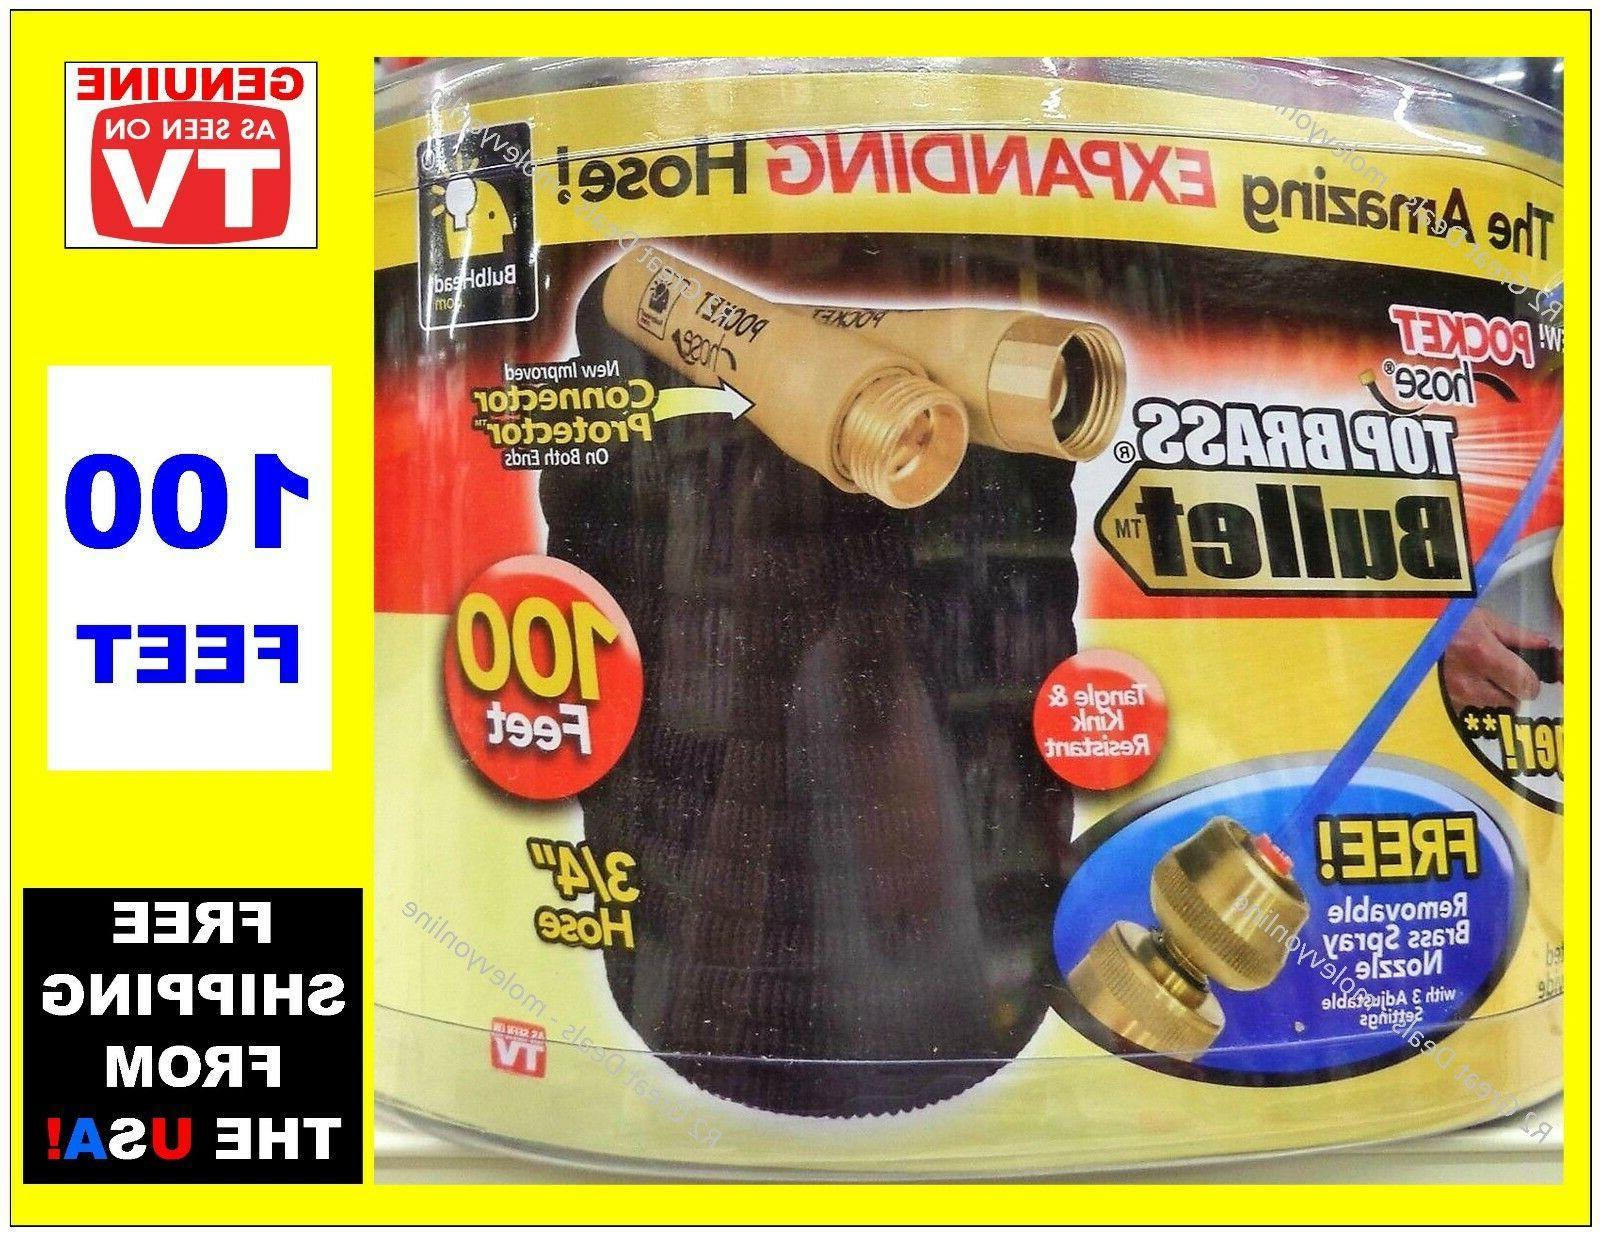 POCKET HOSE Top Brass Bullet Expanding Water Hose QTY 2 x 10